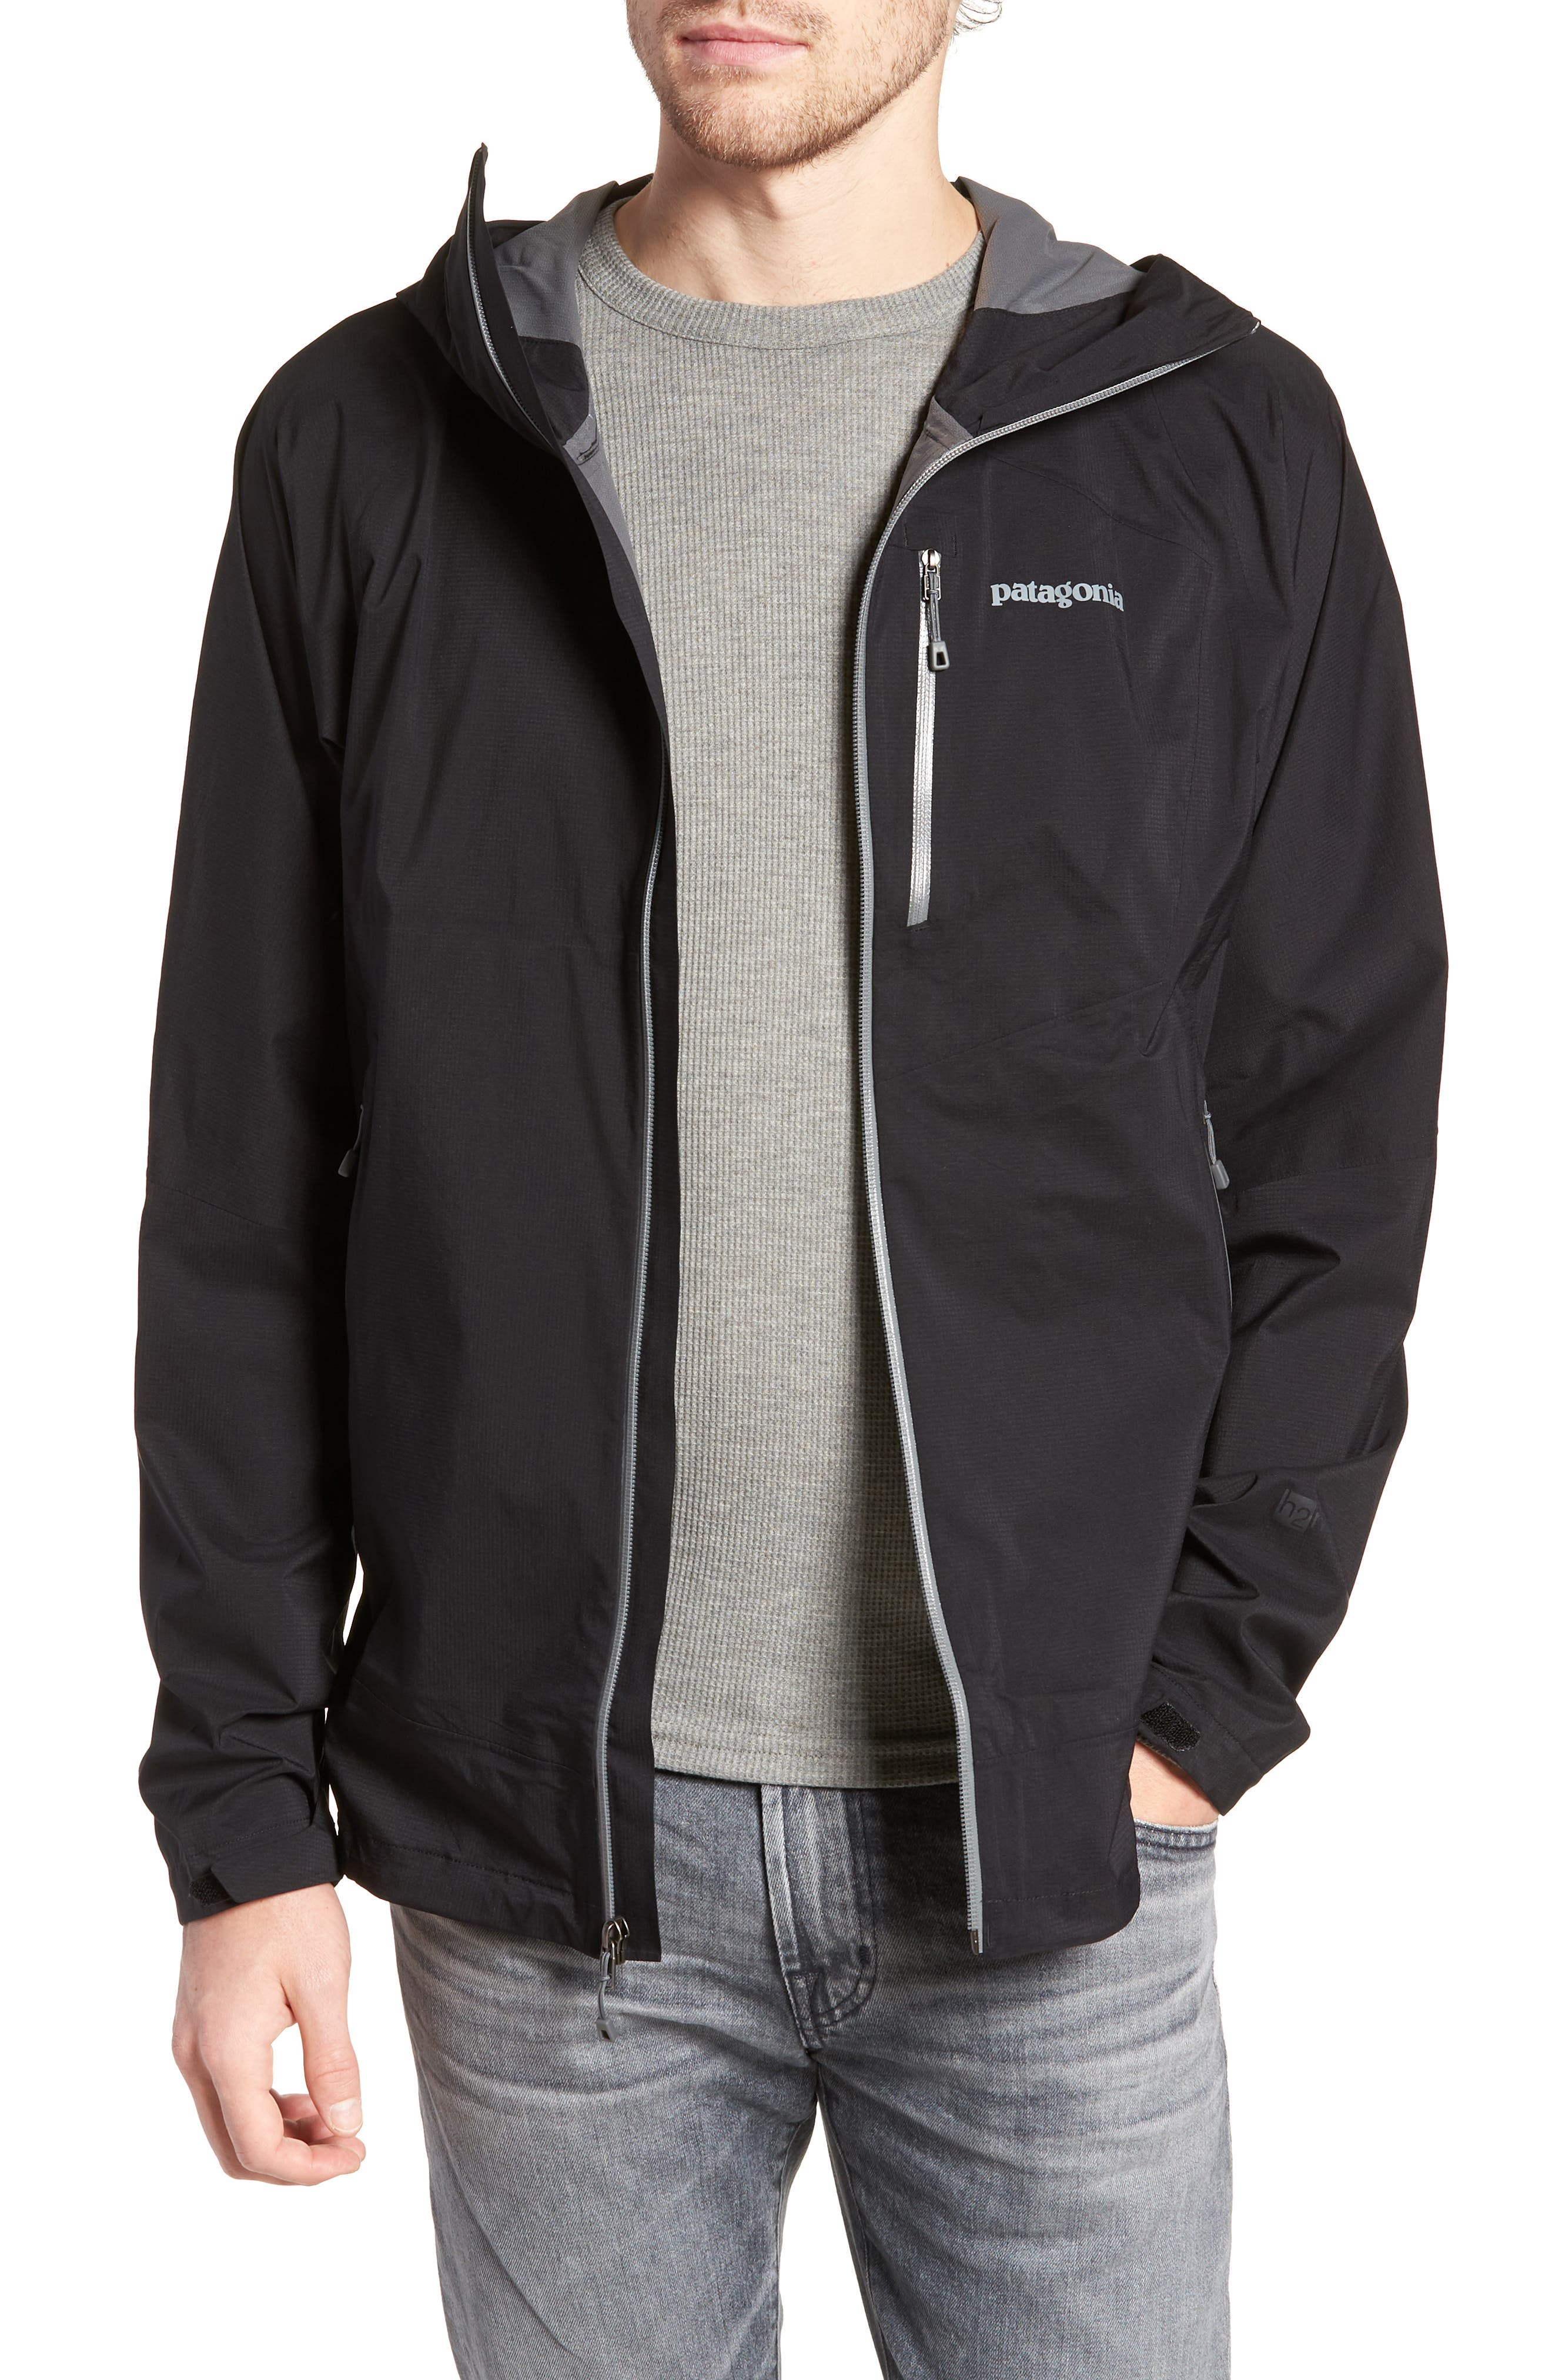 PATAGONIA Stretch Rainshadow Jacket, Main, color, 001